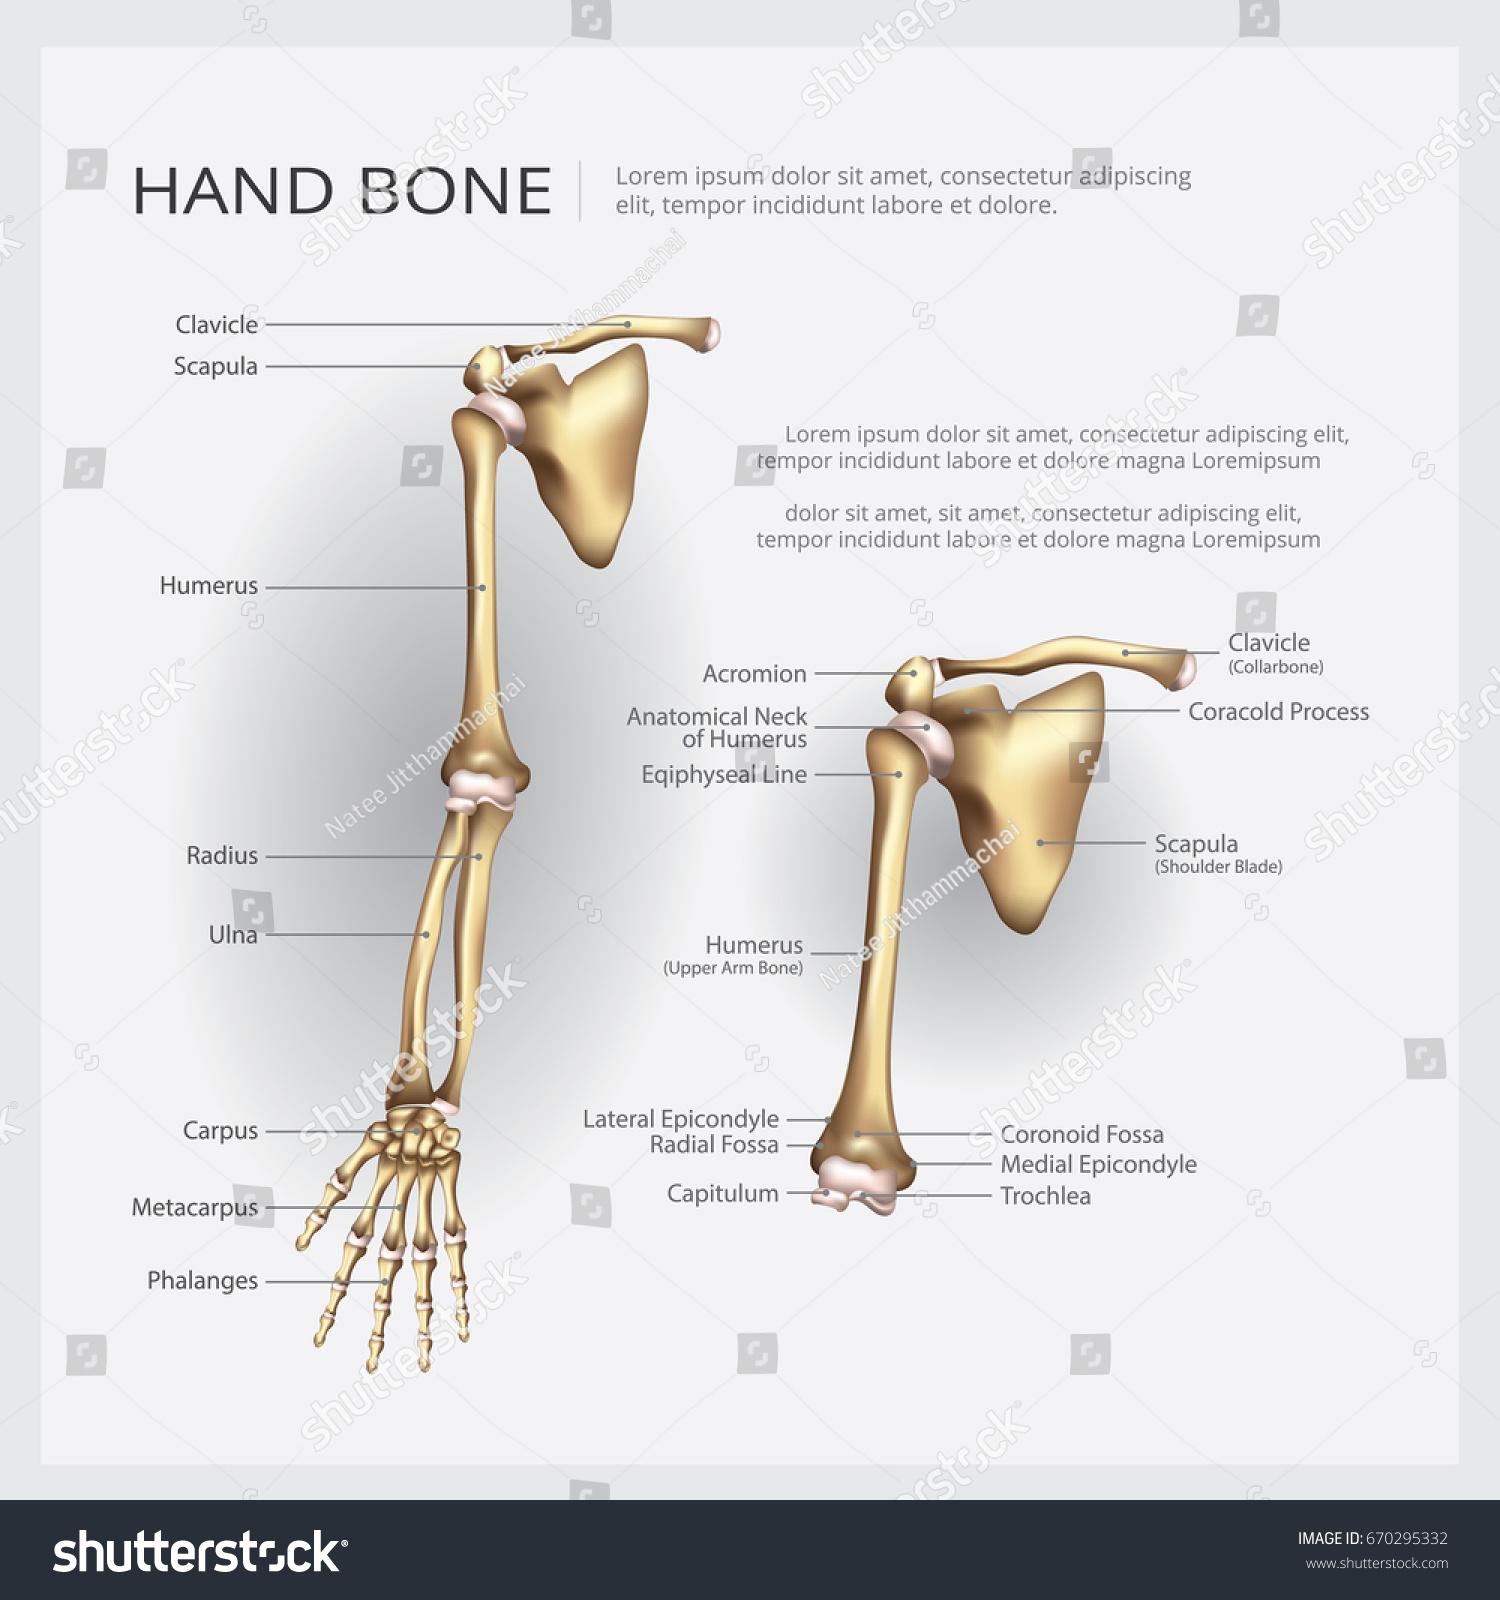 Arm Hand Bone Vector Illustration Stock Vector 670295332 - Shutterstock